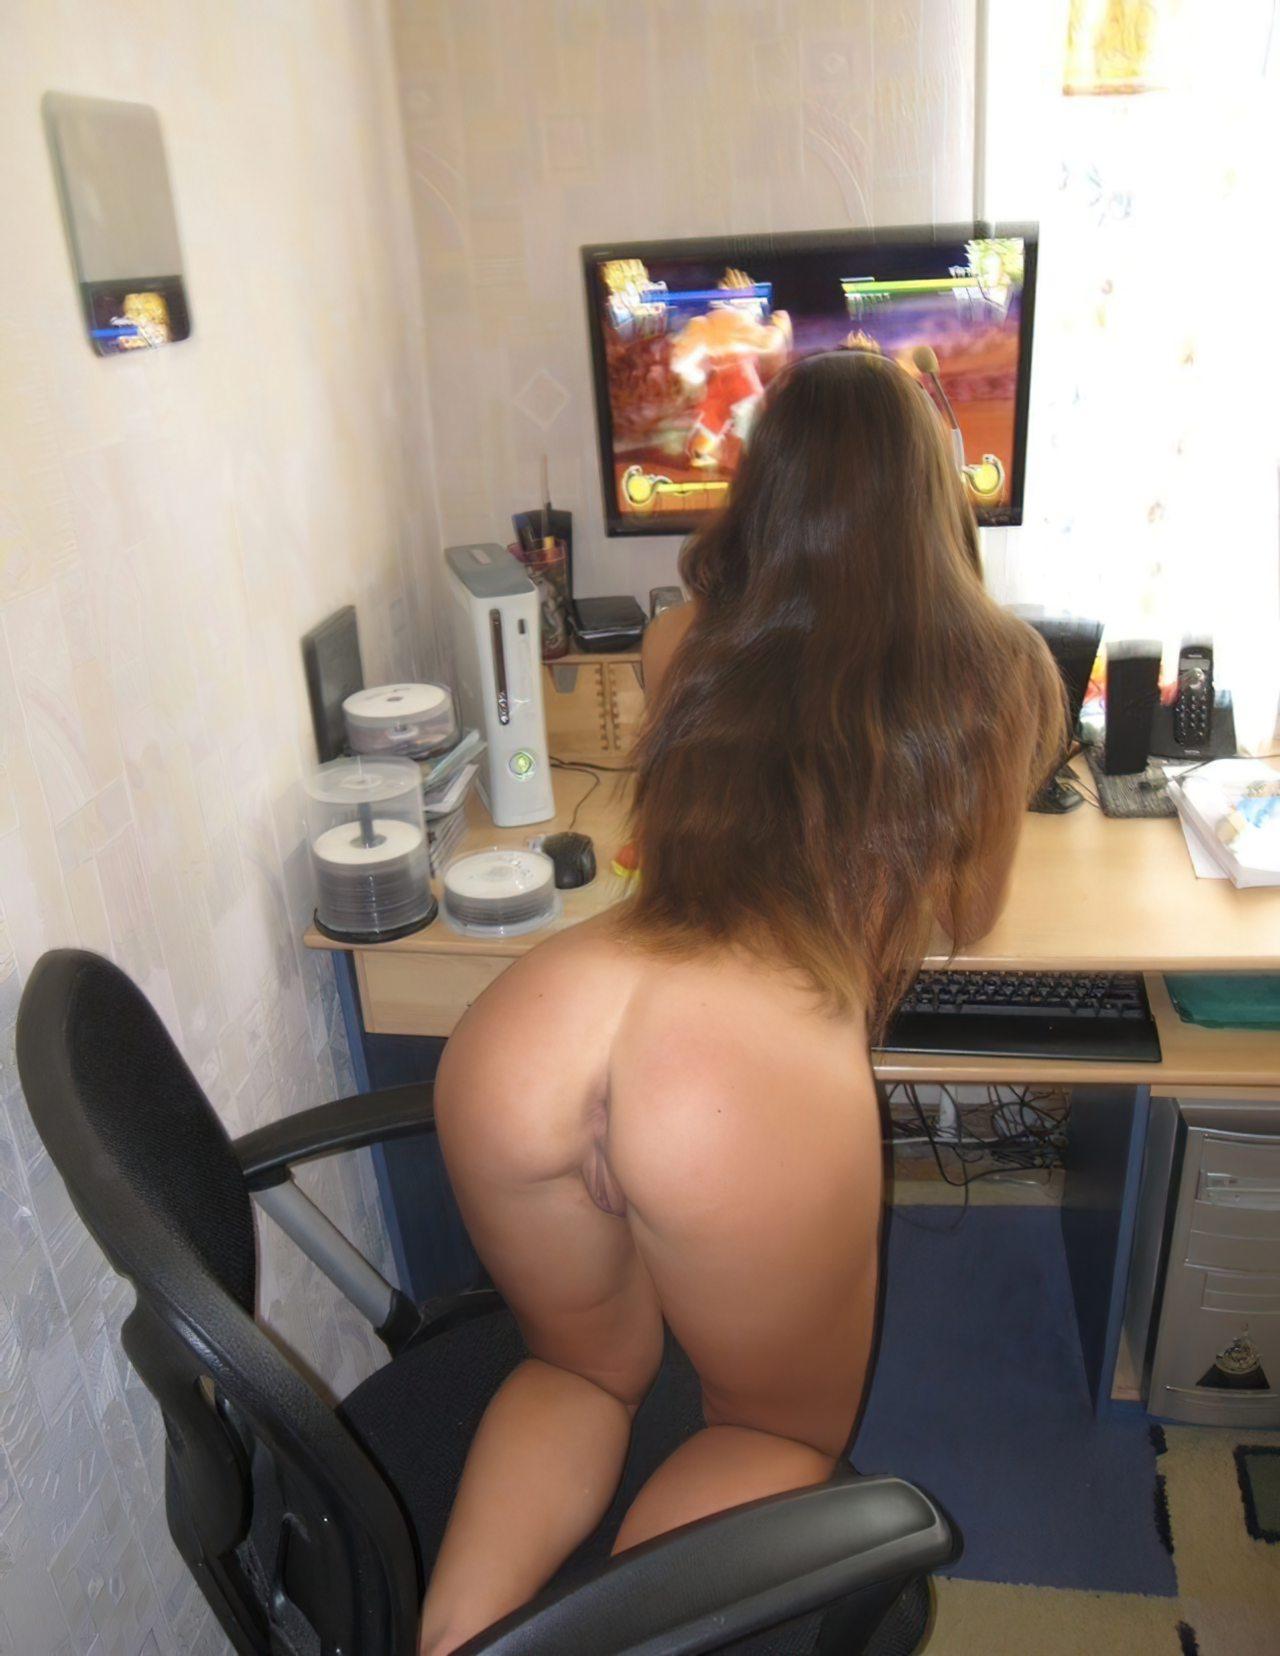 Namorada Jogando na Xbox